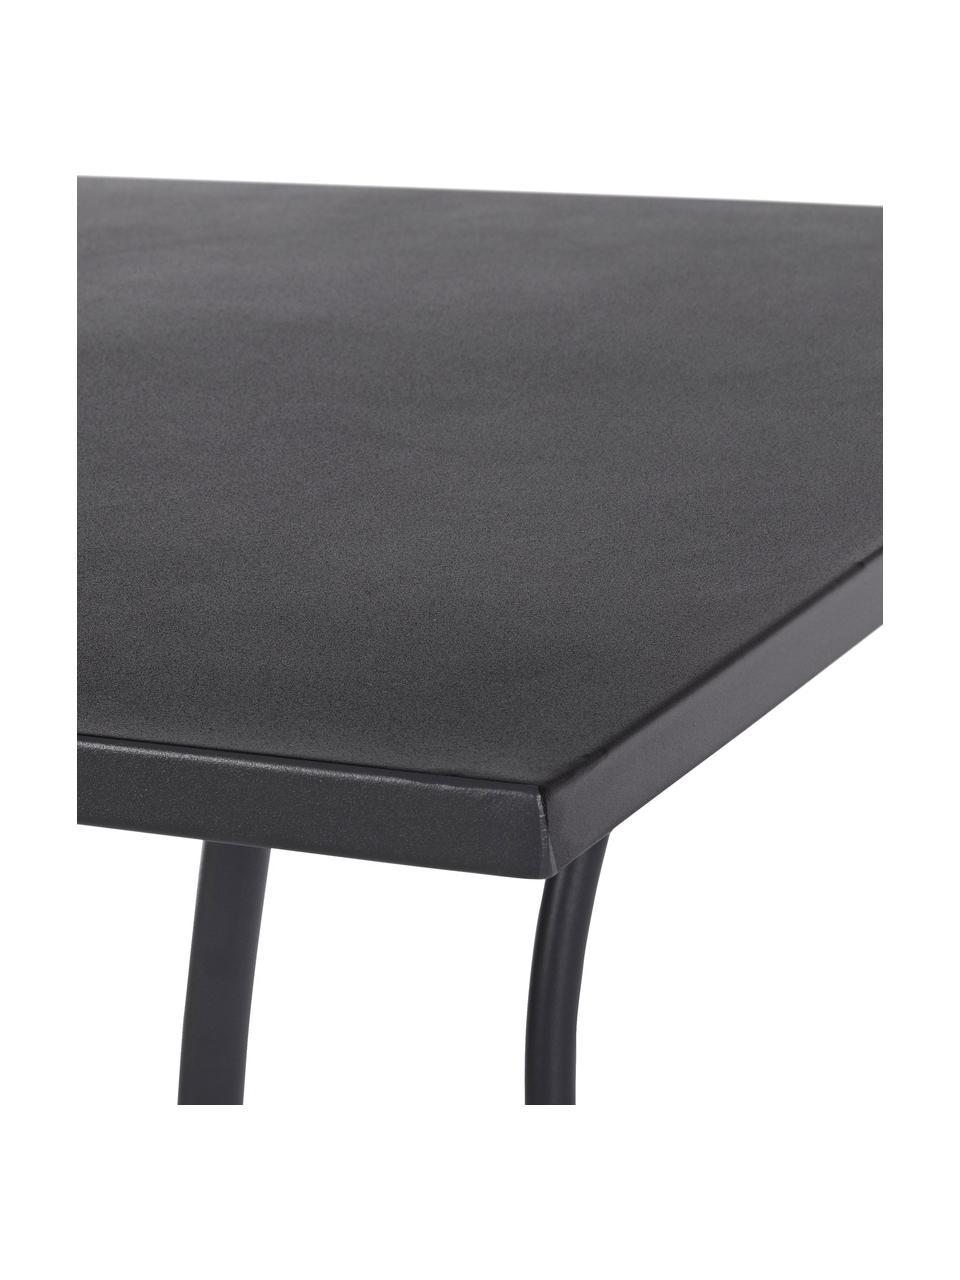 Tavolino da giardino in metallo grigio opaco Kelsie, Metallo verniciato a polvere, Grigio, Larg. 70 x Prof. 70 cm